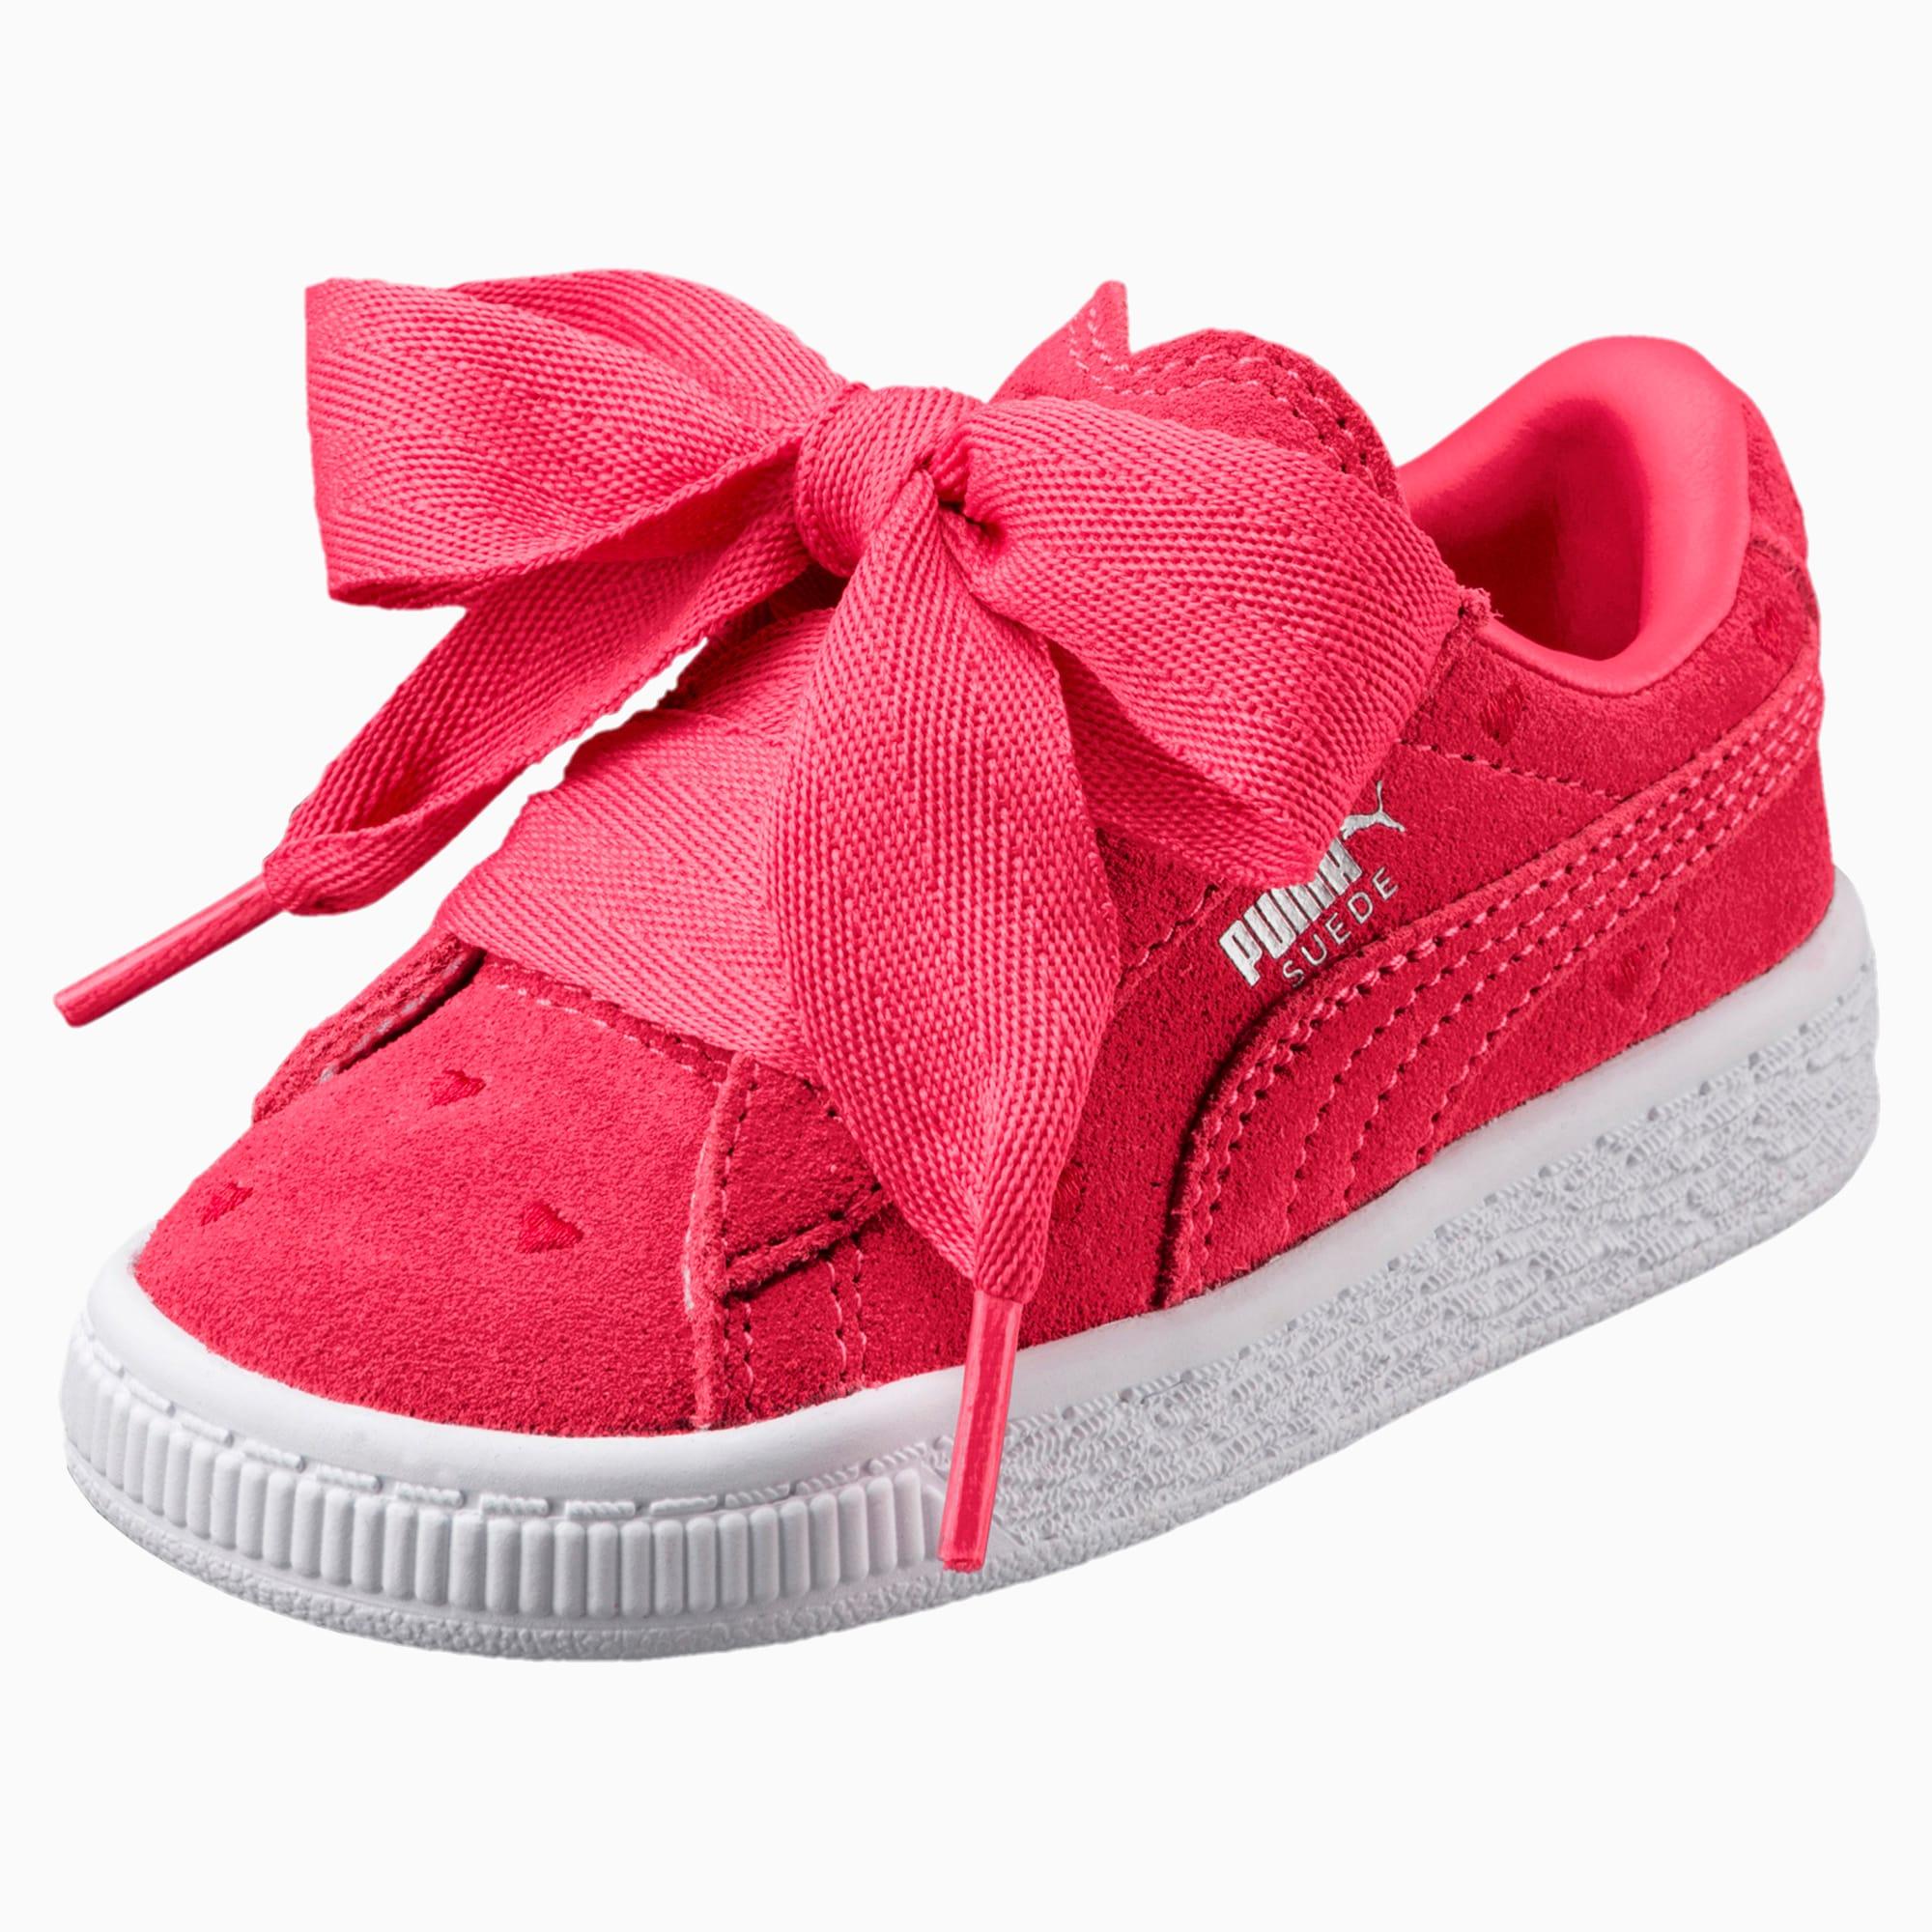 Suede Heart Valentine Little Kids' Shoes